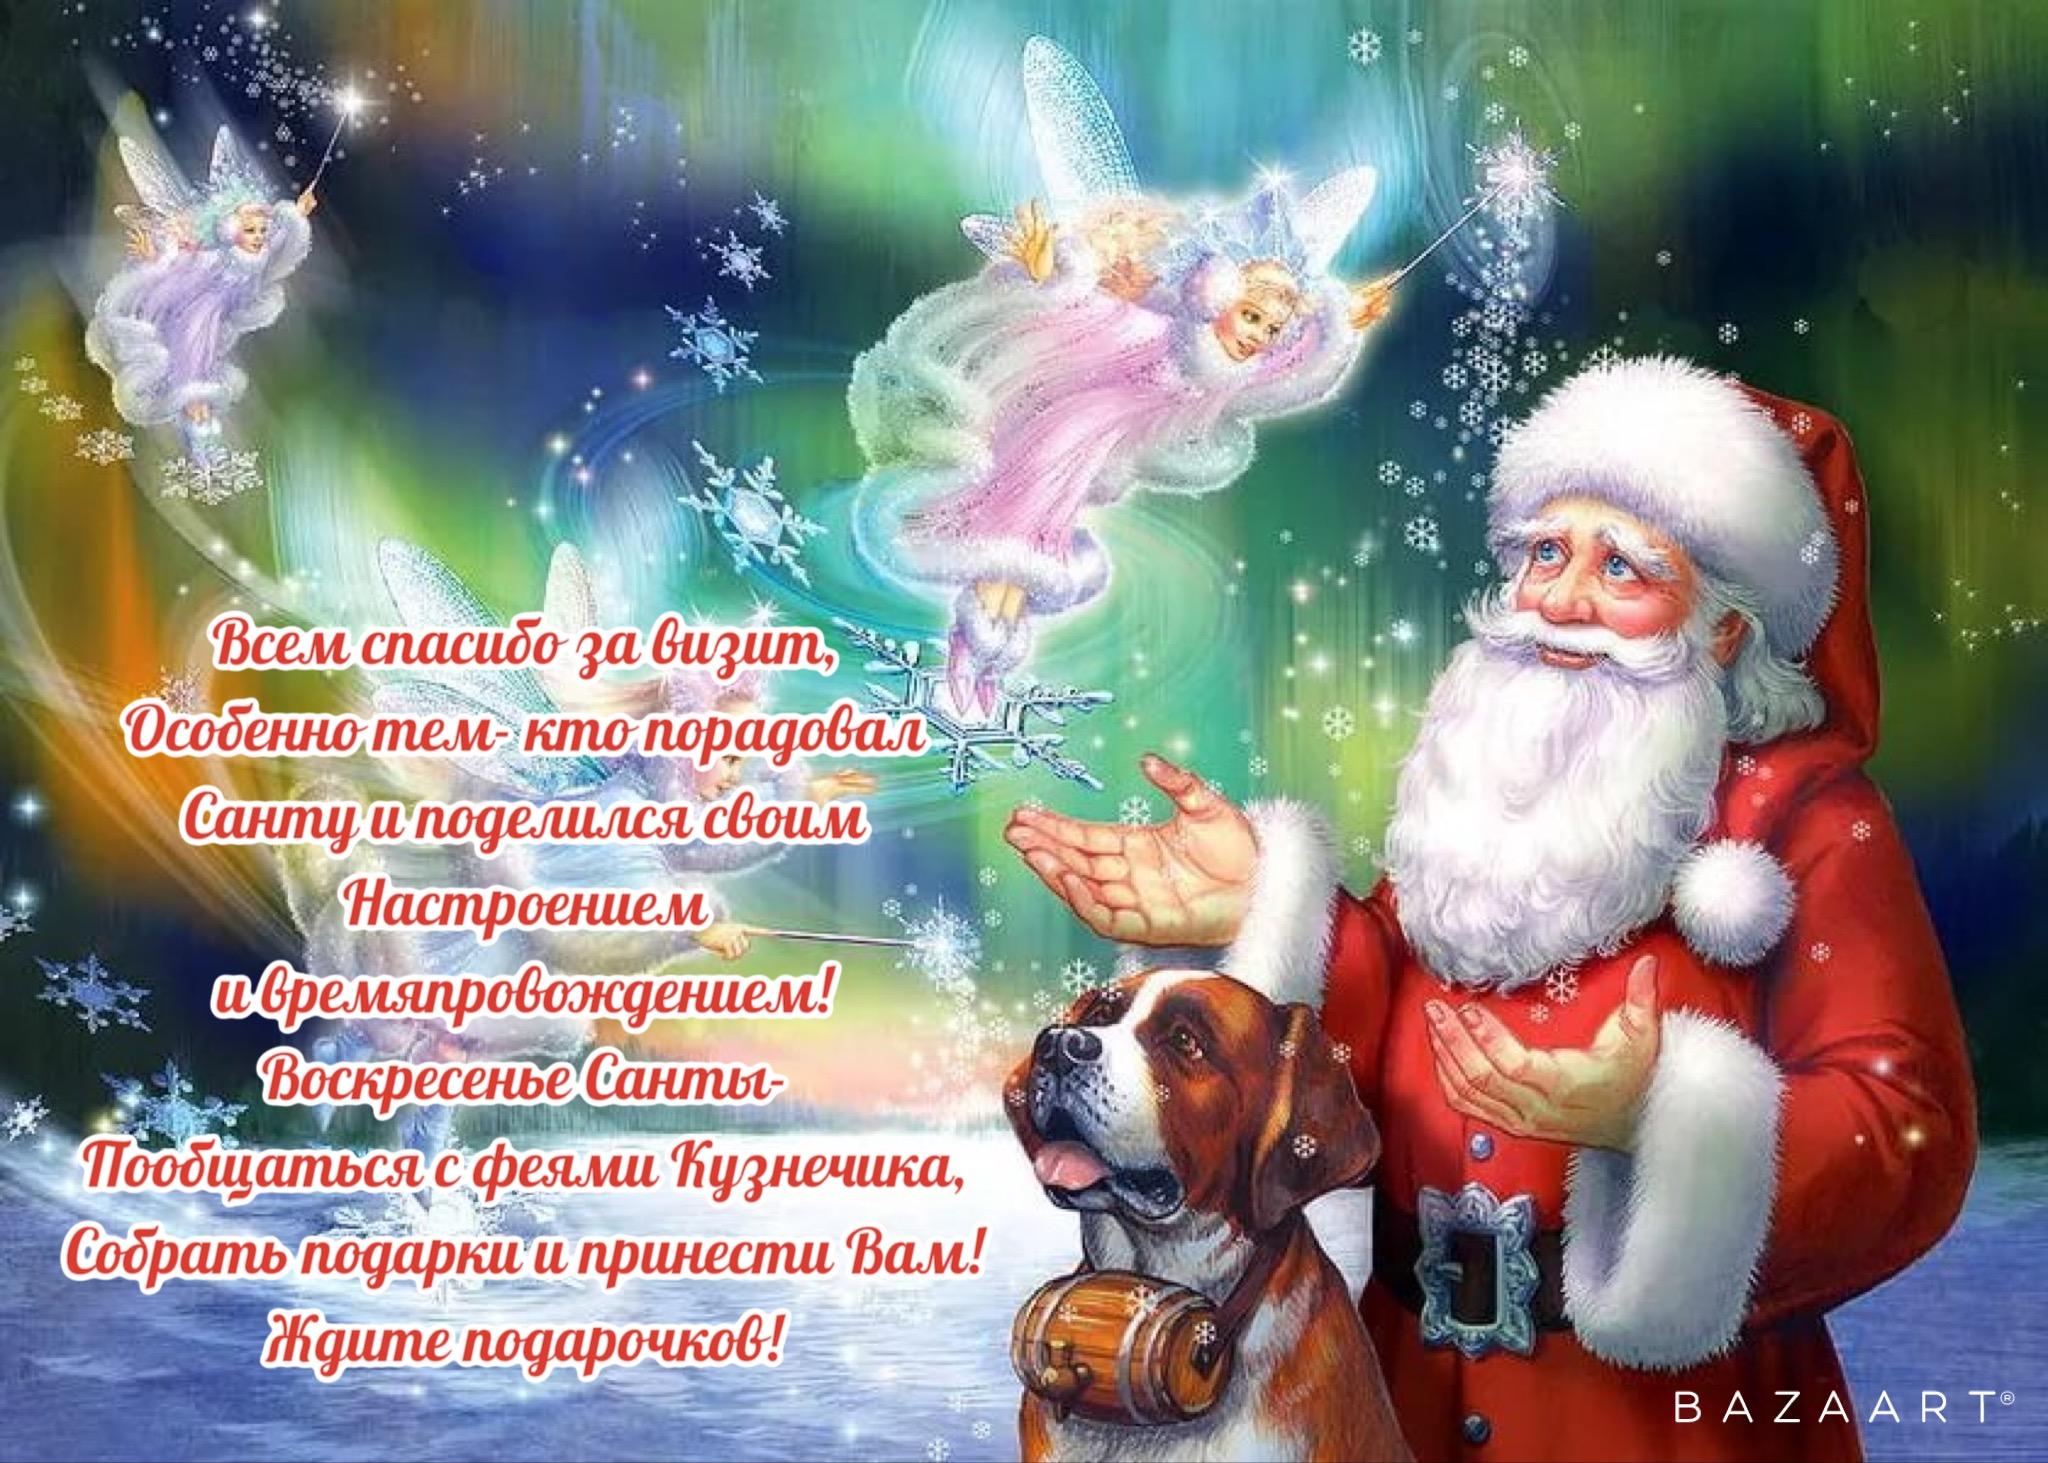 https://i6.imageban.ru/out/2019/11/10/d9eabe7798133ed85bd64c32e1f2f736.jpg